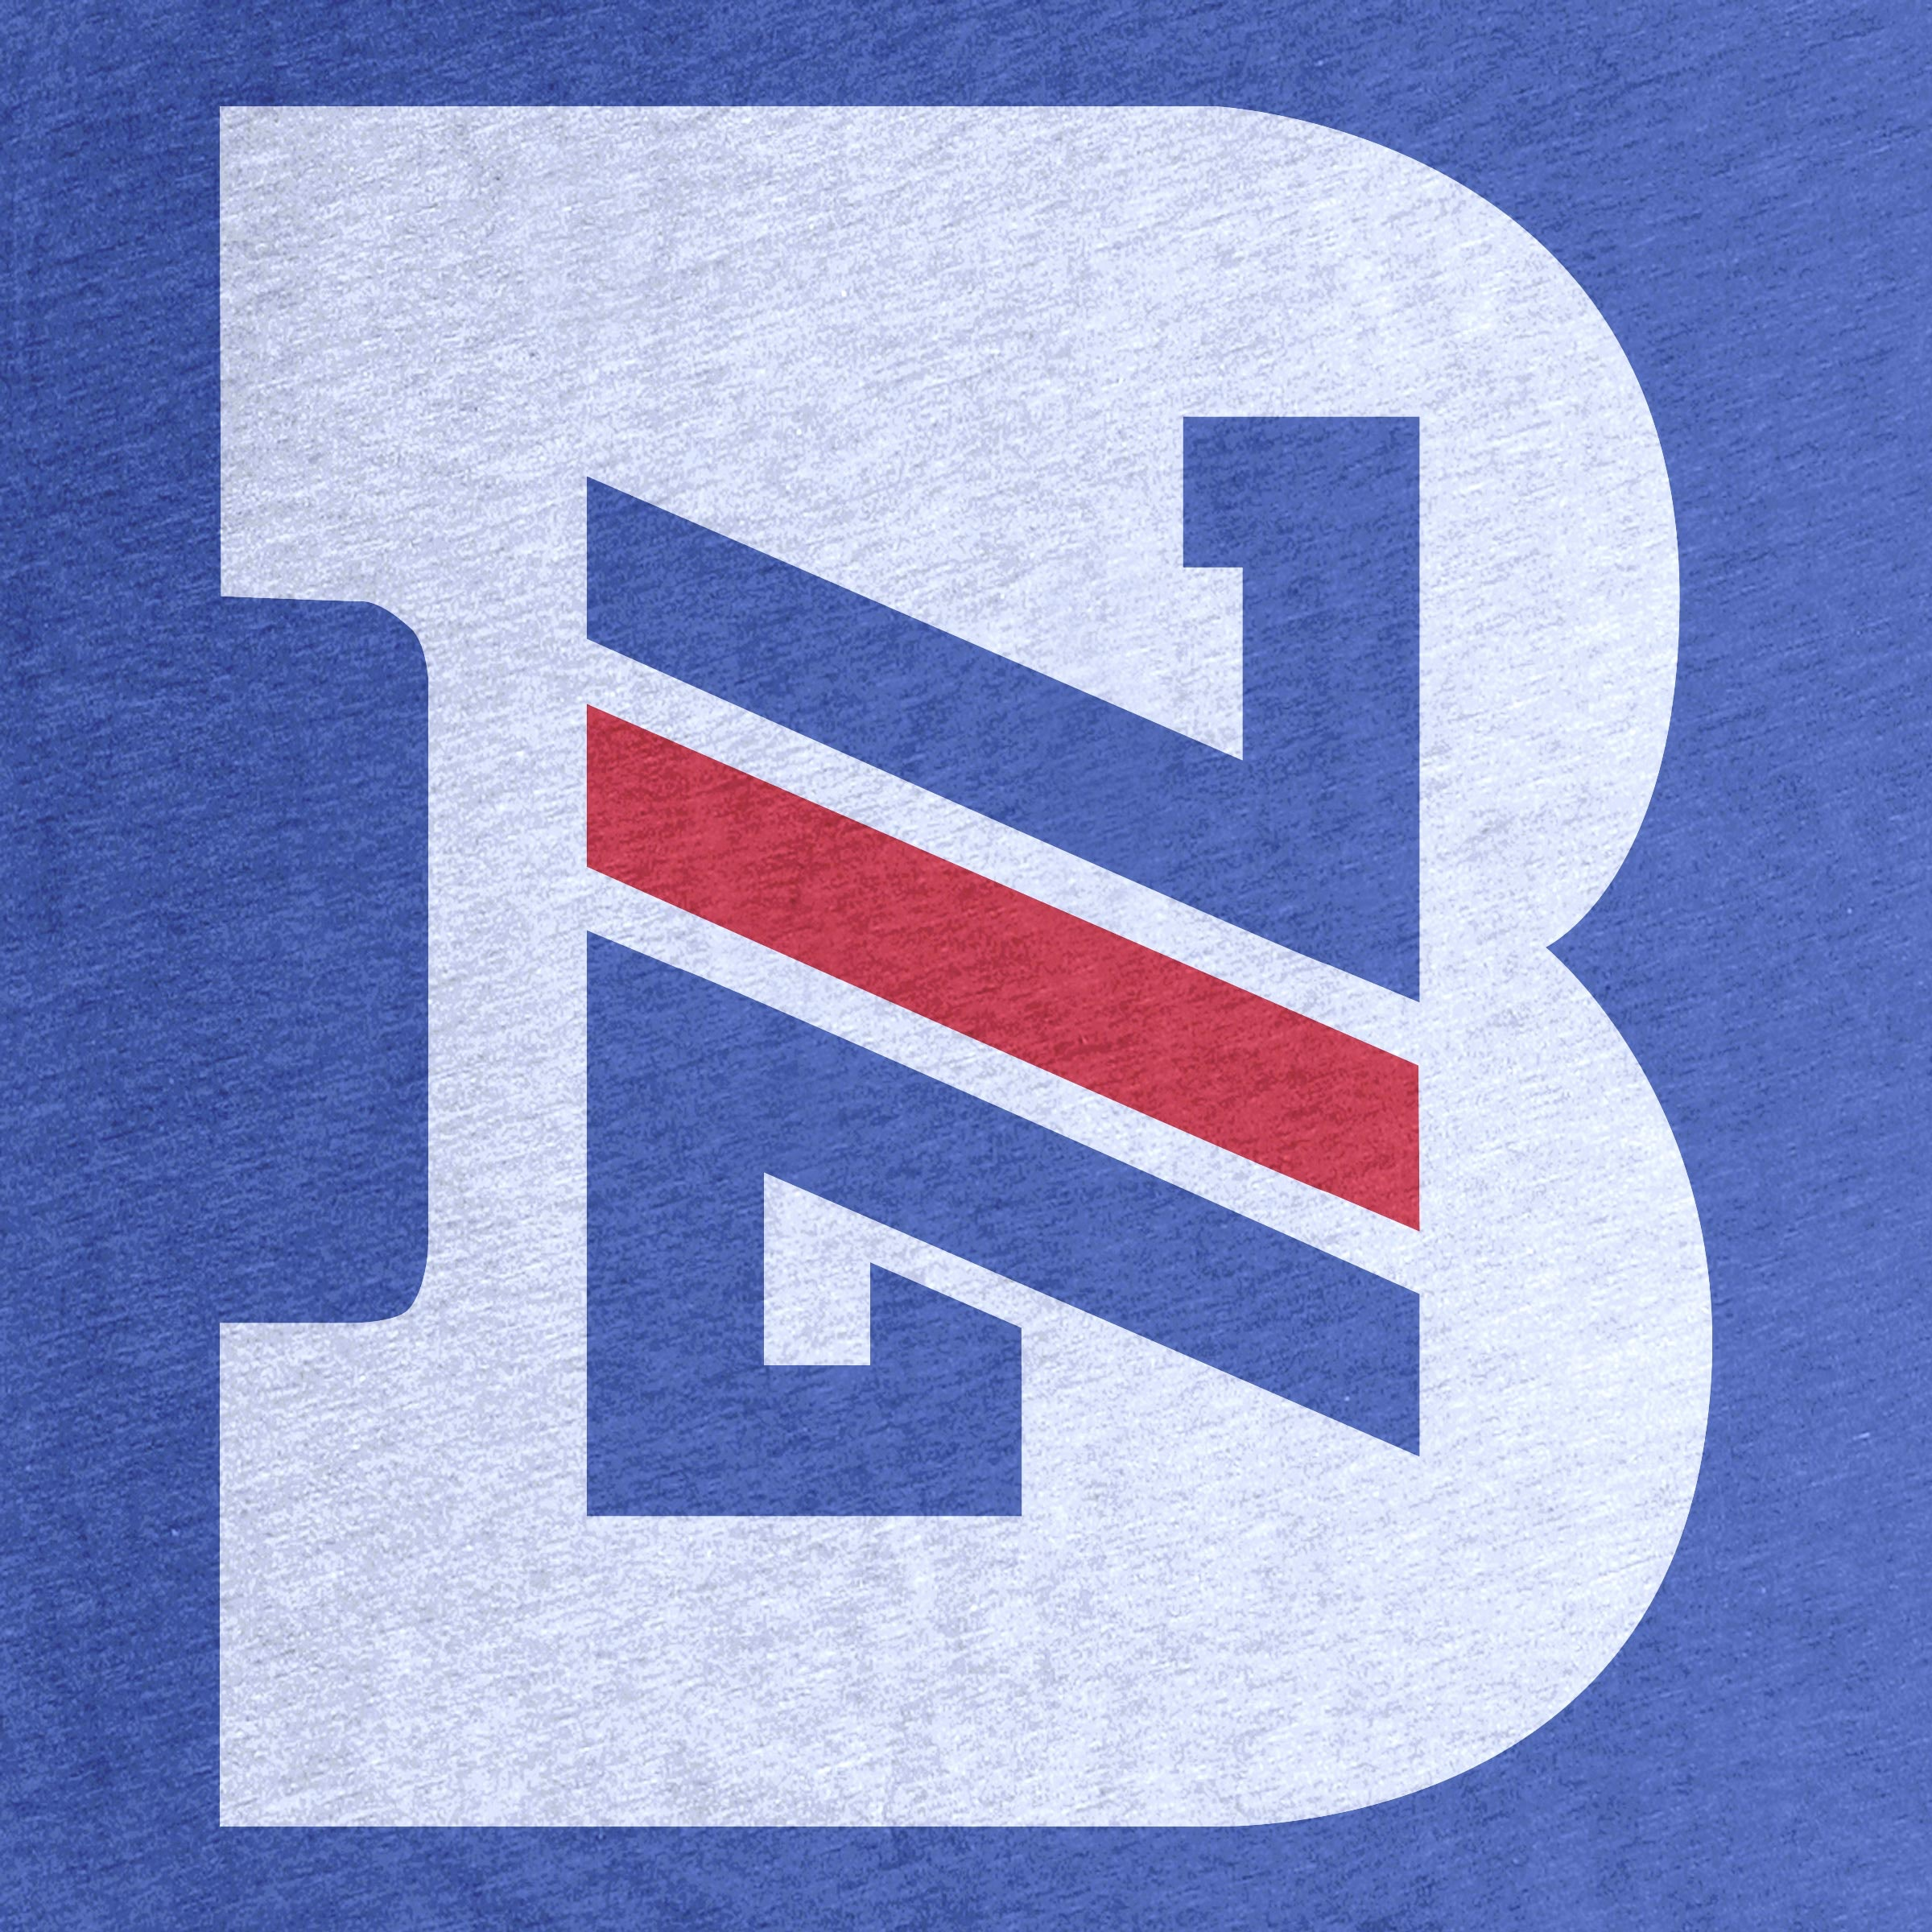 Buffalo: The 716